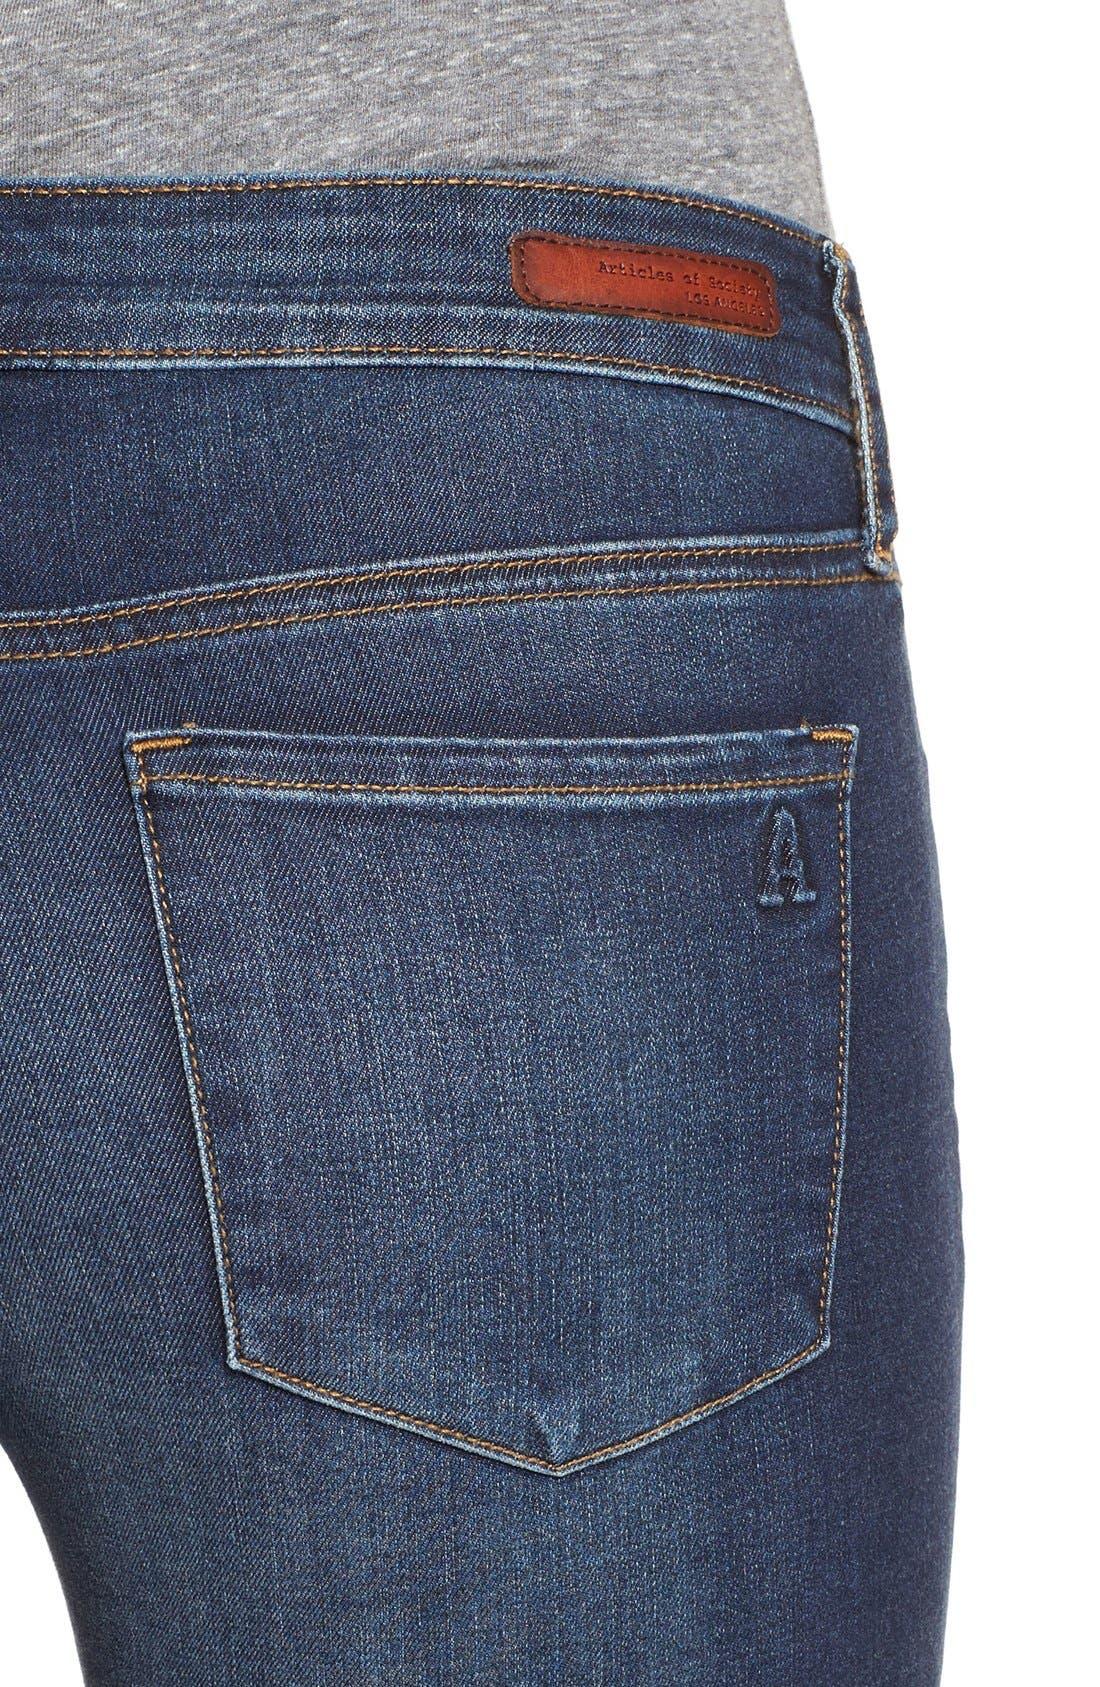 Alternate Image 4  - Articles of Society 'Mya' Skinny Jeans (Glendale)